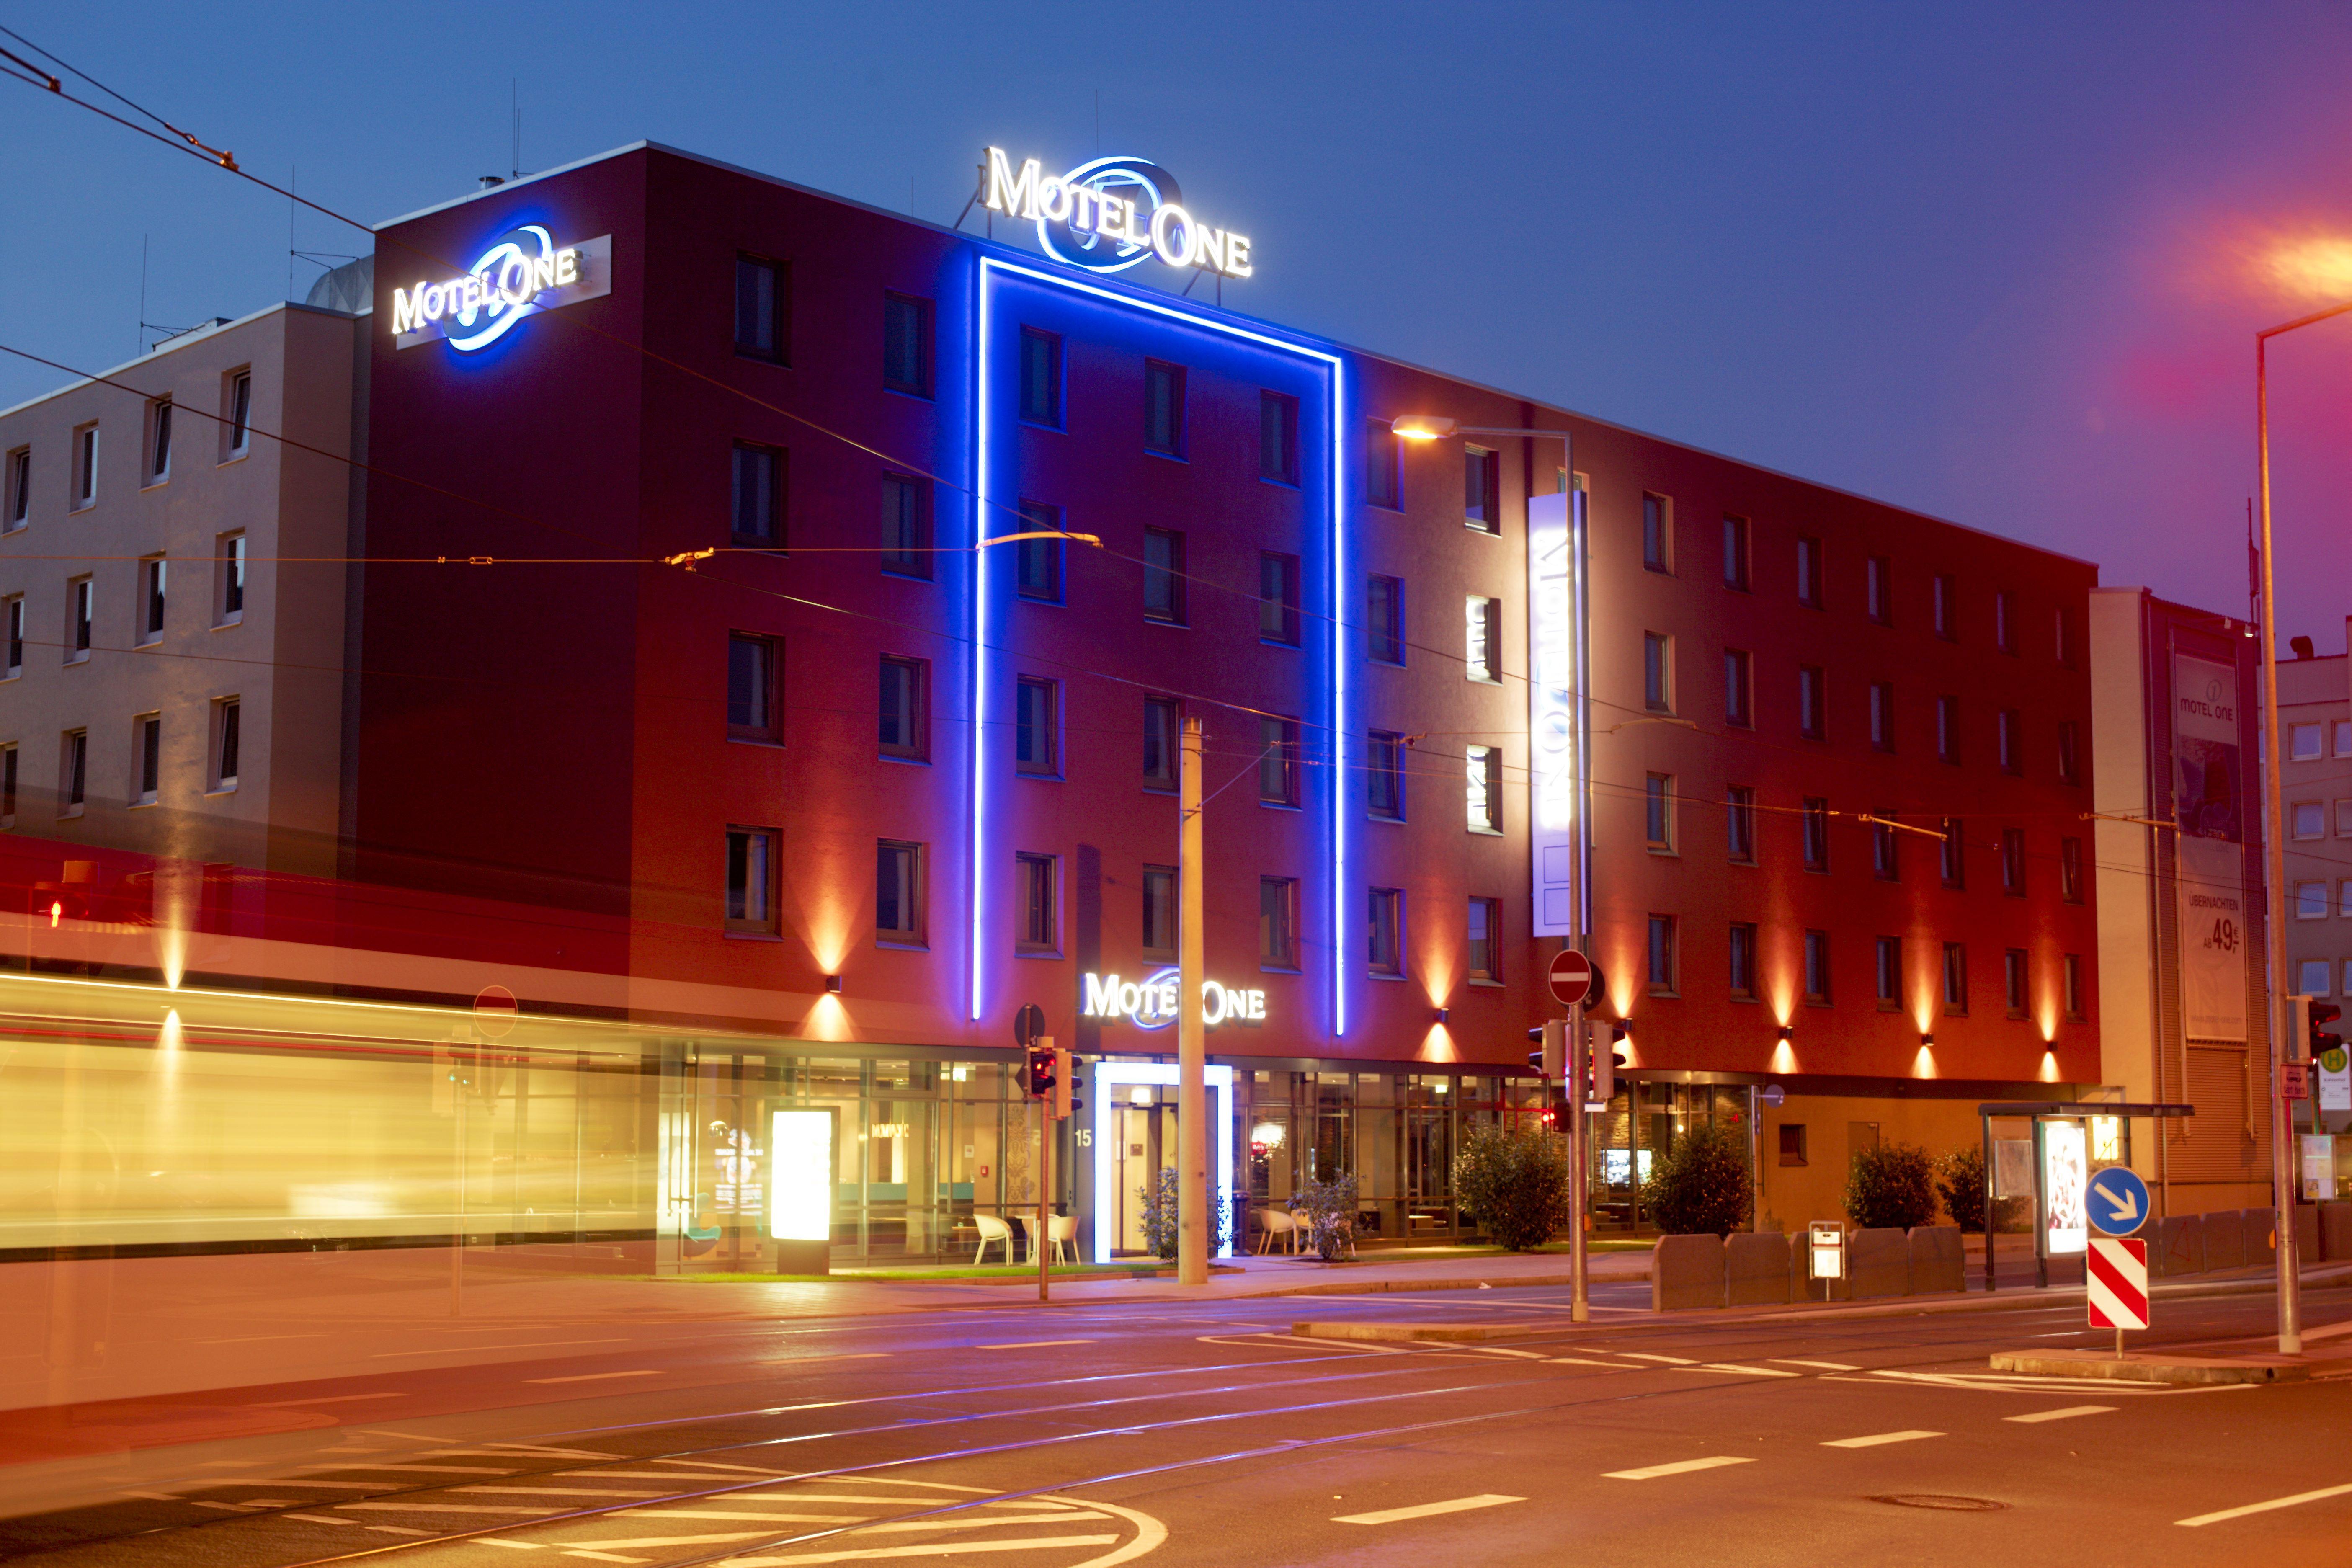 Hotel Nuremberg Plaerrer Motel One Design Hotels Nuremberg Plarrer